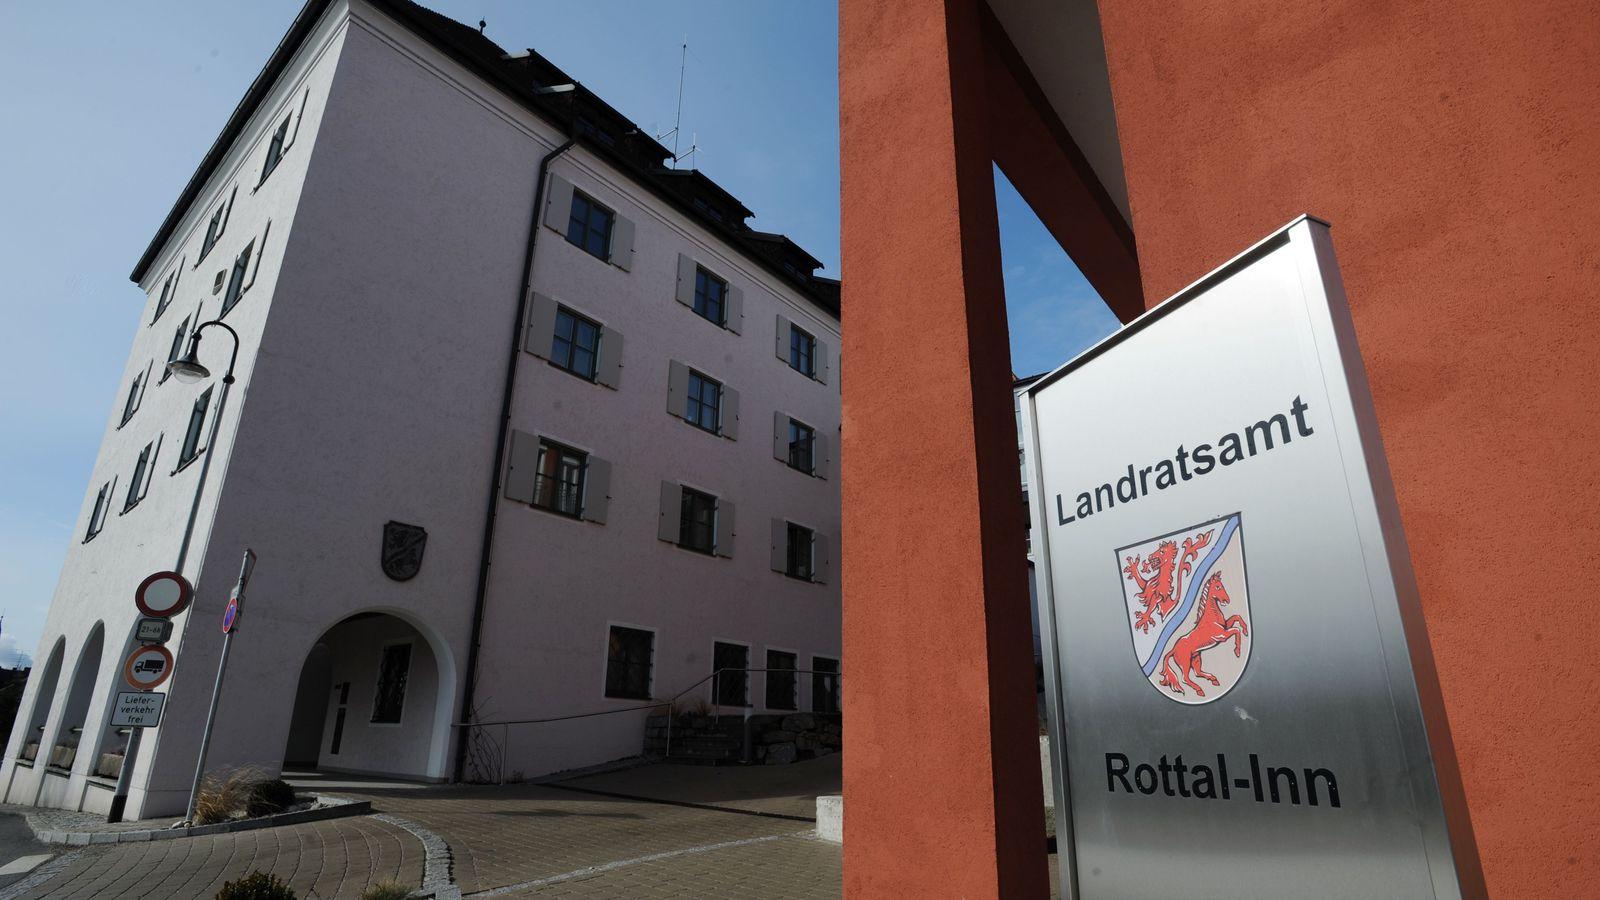 Faktischer Lockdown im Landkreis Rottal-Inn beschlossen